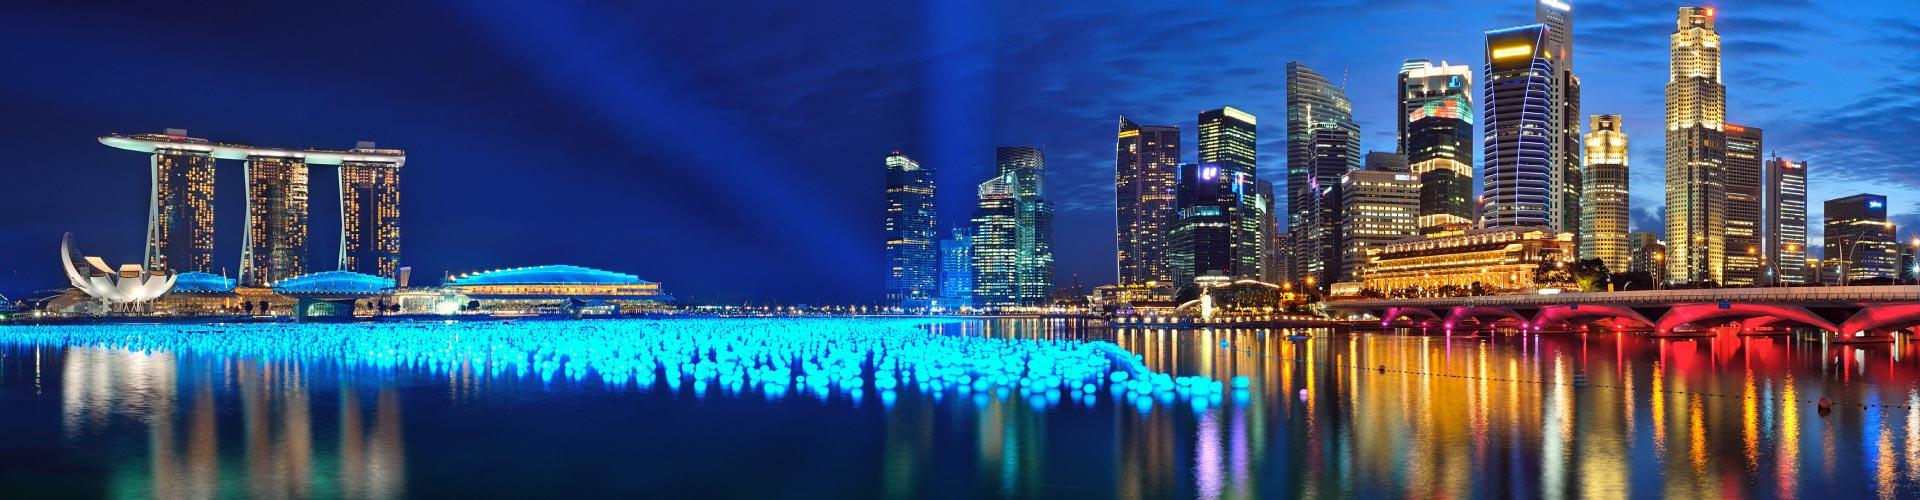 Singapore, Malaysia Islands